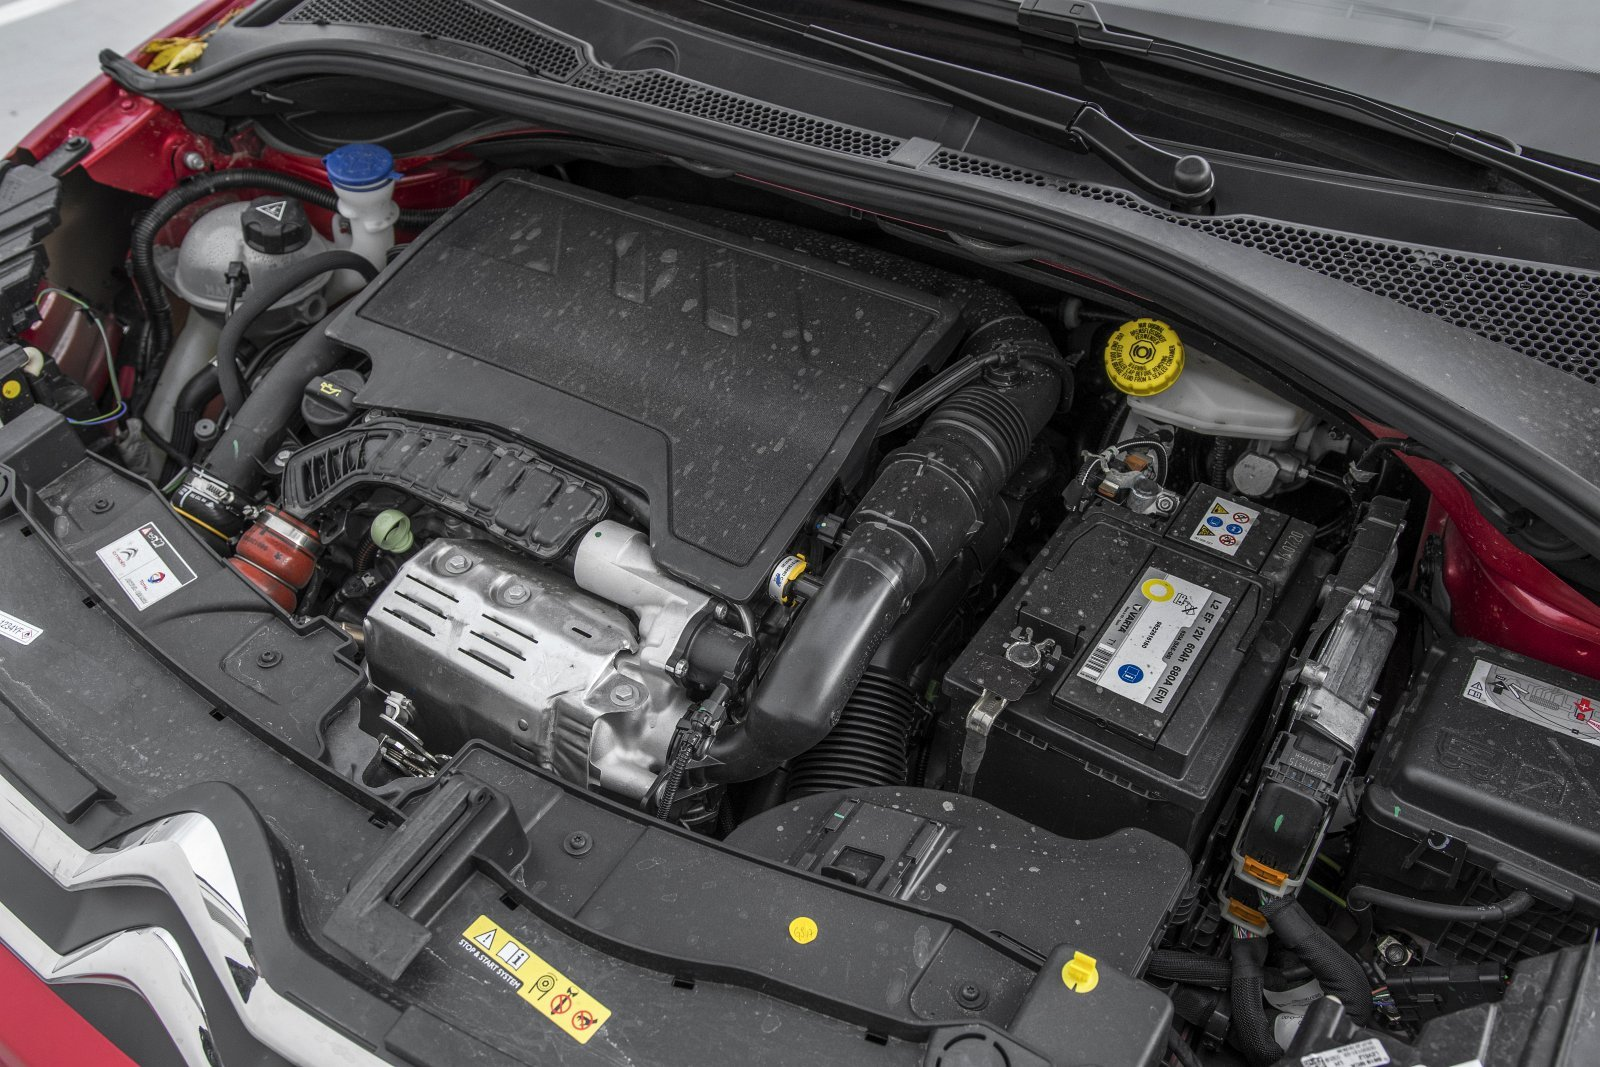 Citroen C3 1.2 PureTech 110 test 2020 - silnik